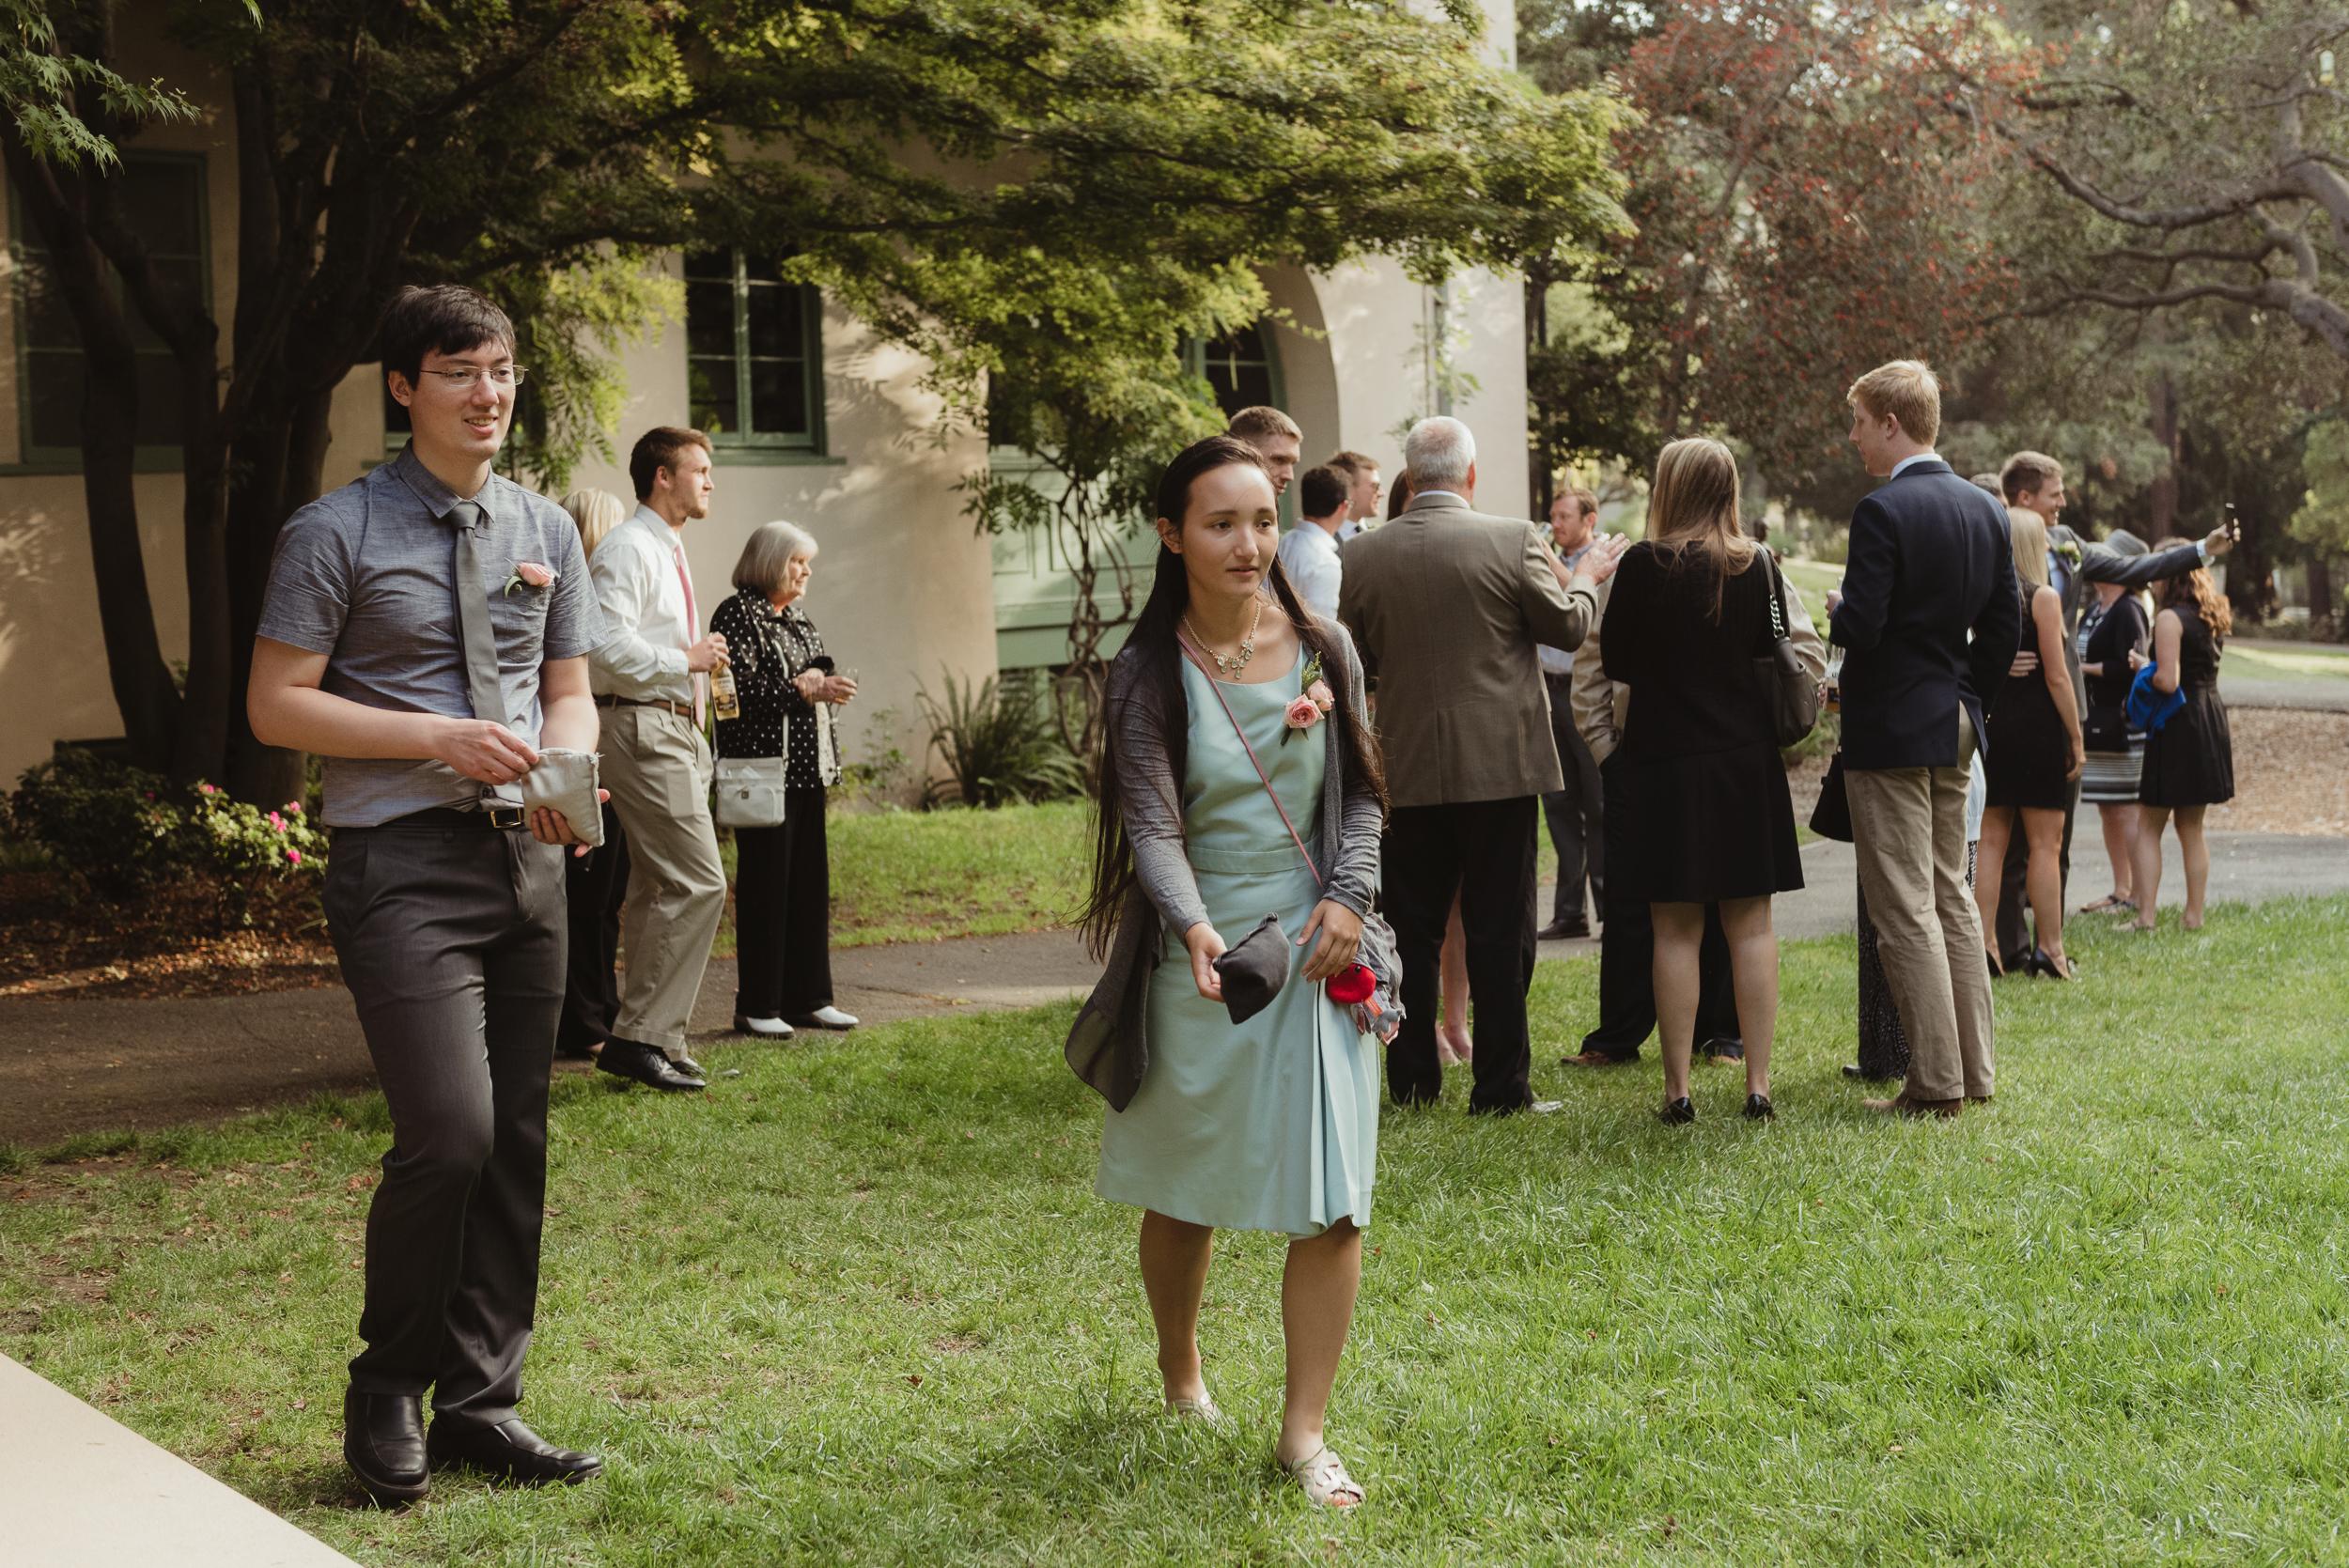 faculty-club-berkeley-wedding-photographer-vc051.jpg